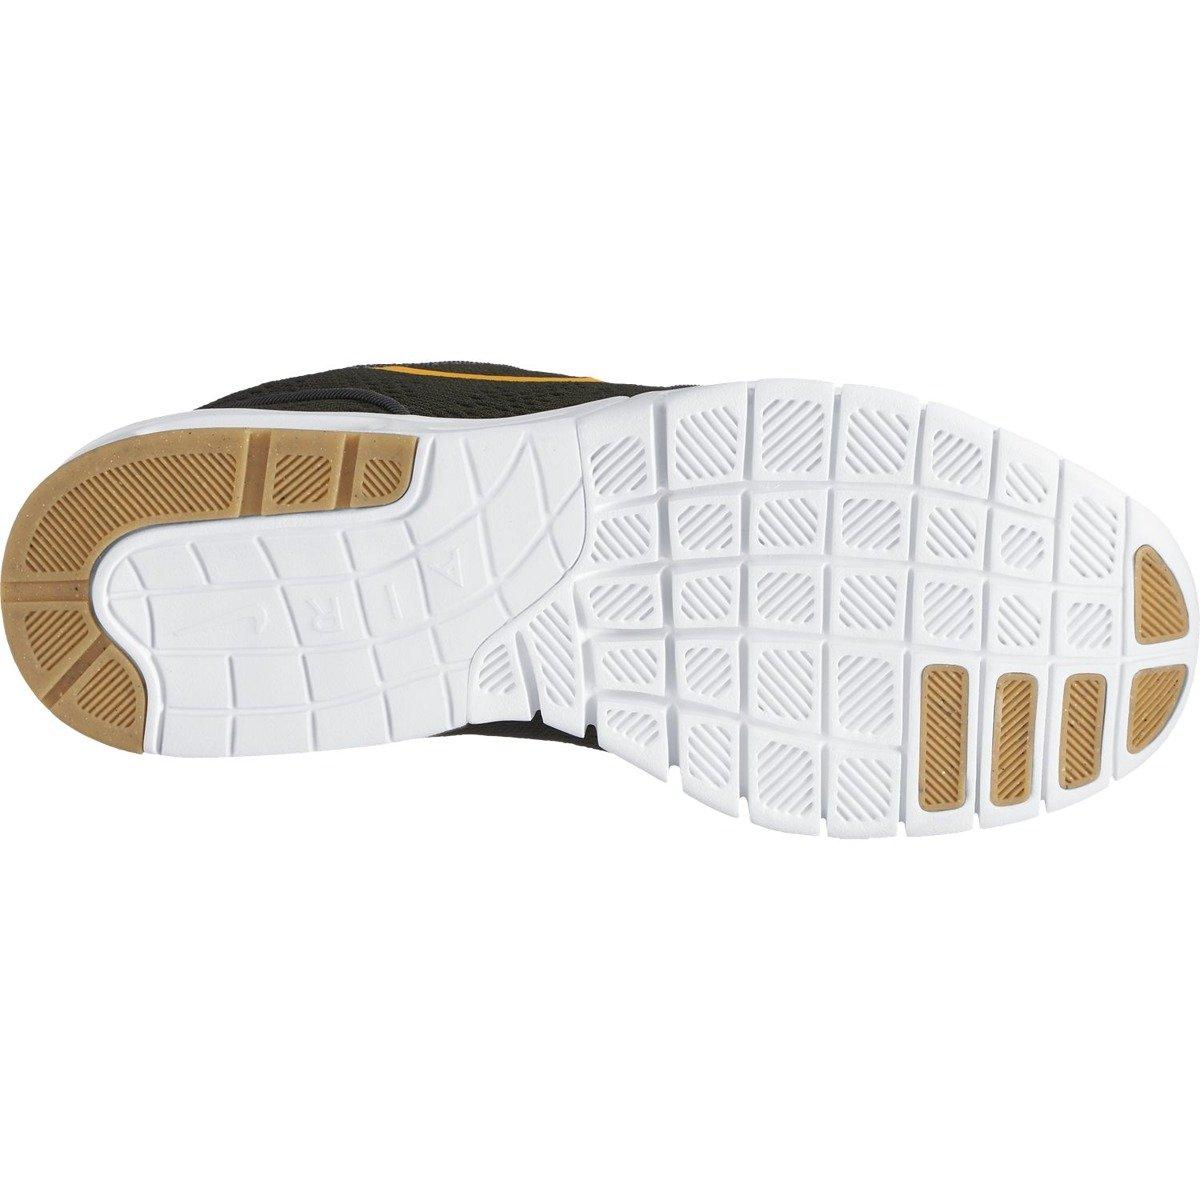 f38f267376 ... shoes nike sb stefan janoski max sequoia/circuit orange-gum light brown  Click to zoom ...